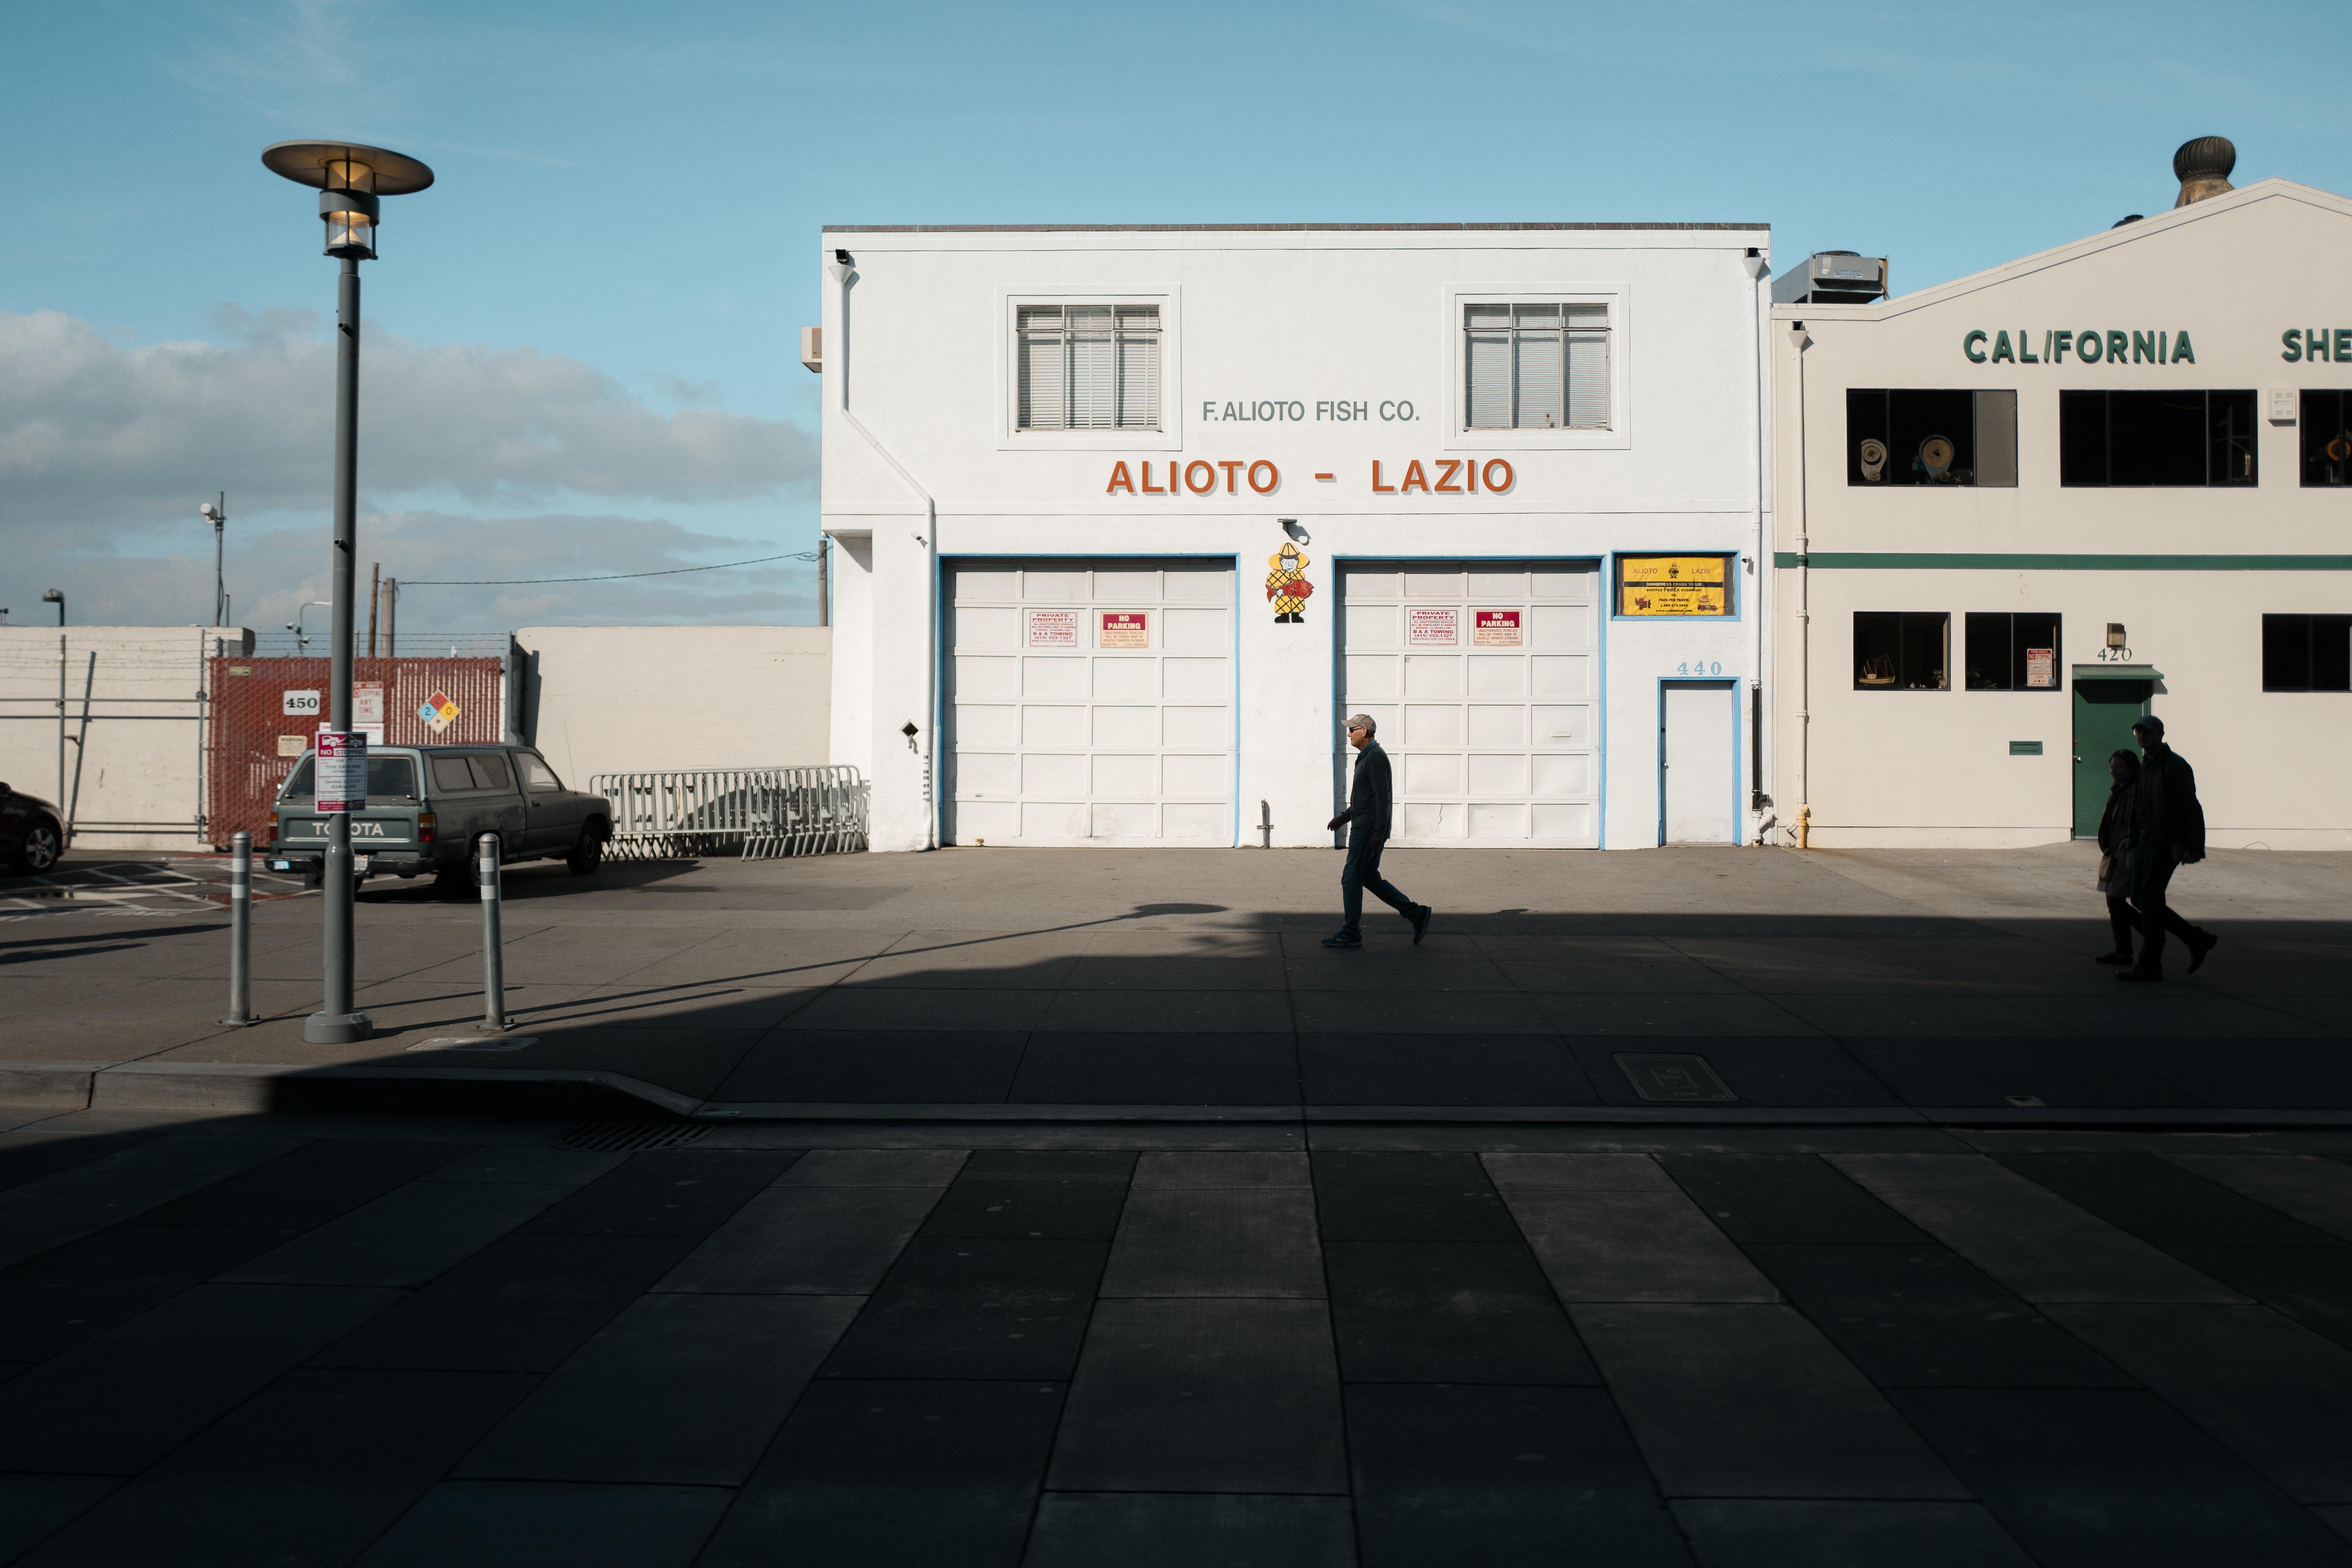 man walking in front of Alioto Lazio building